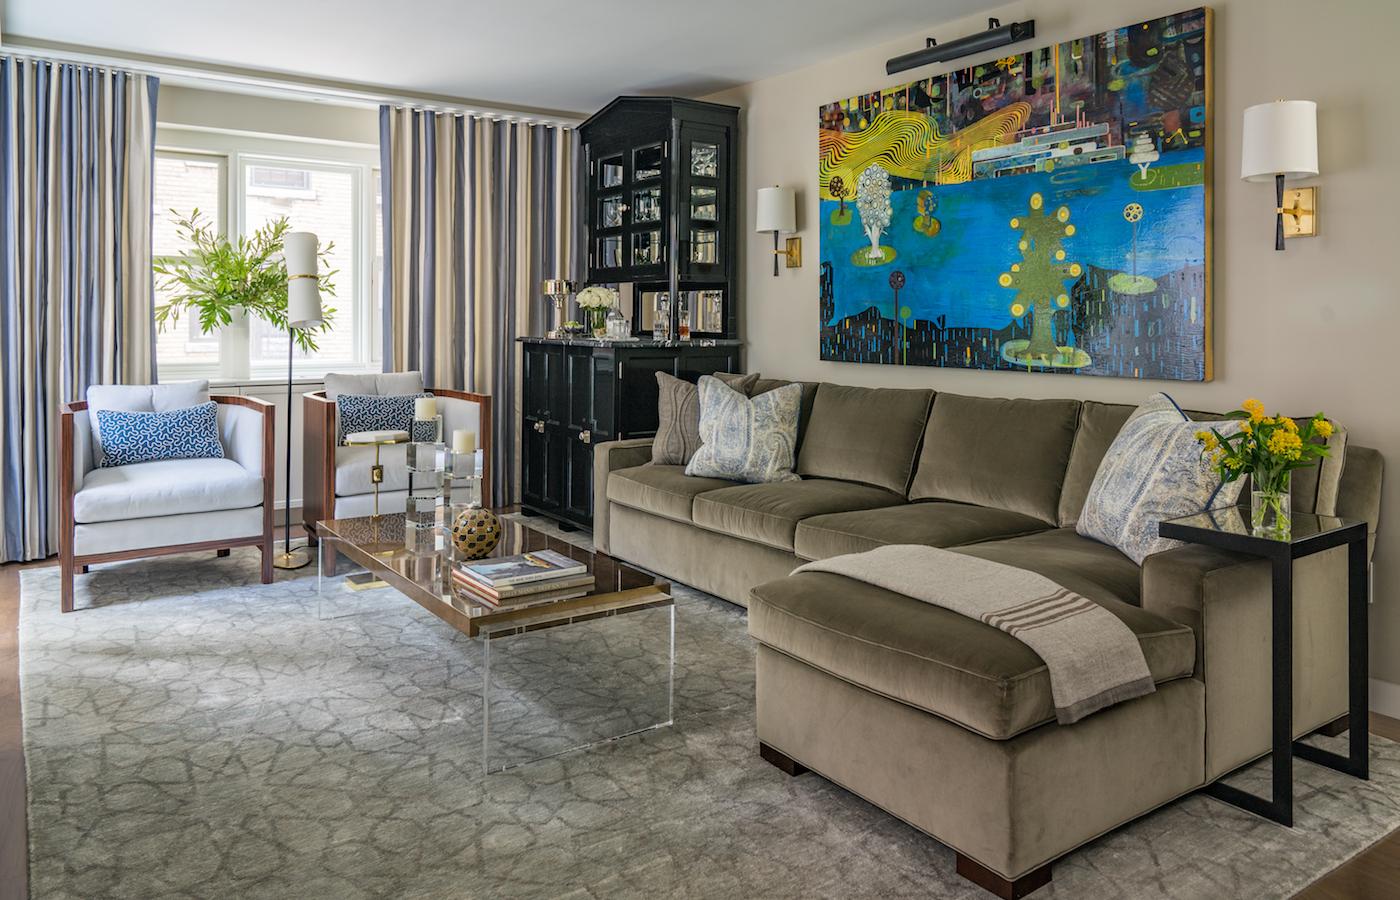 Shor Homes Greenwich Village Apartment